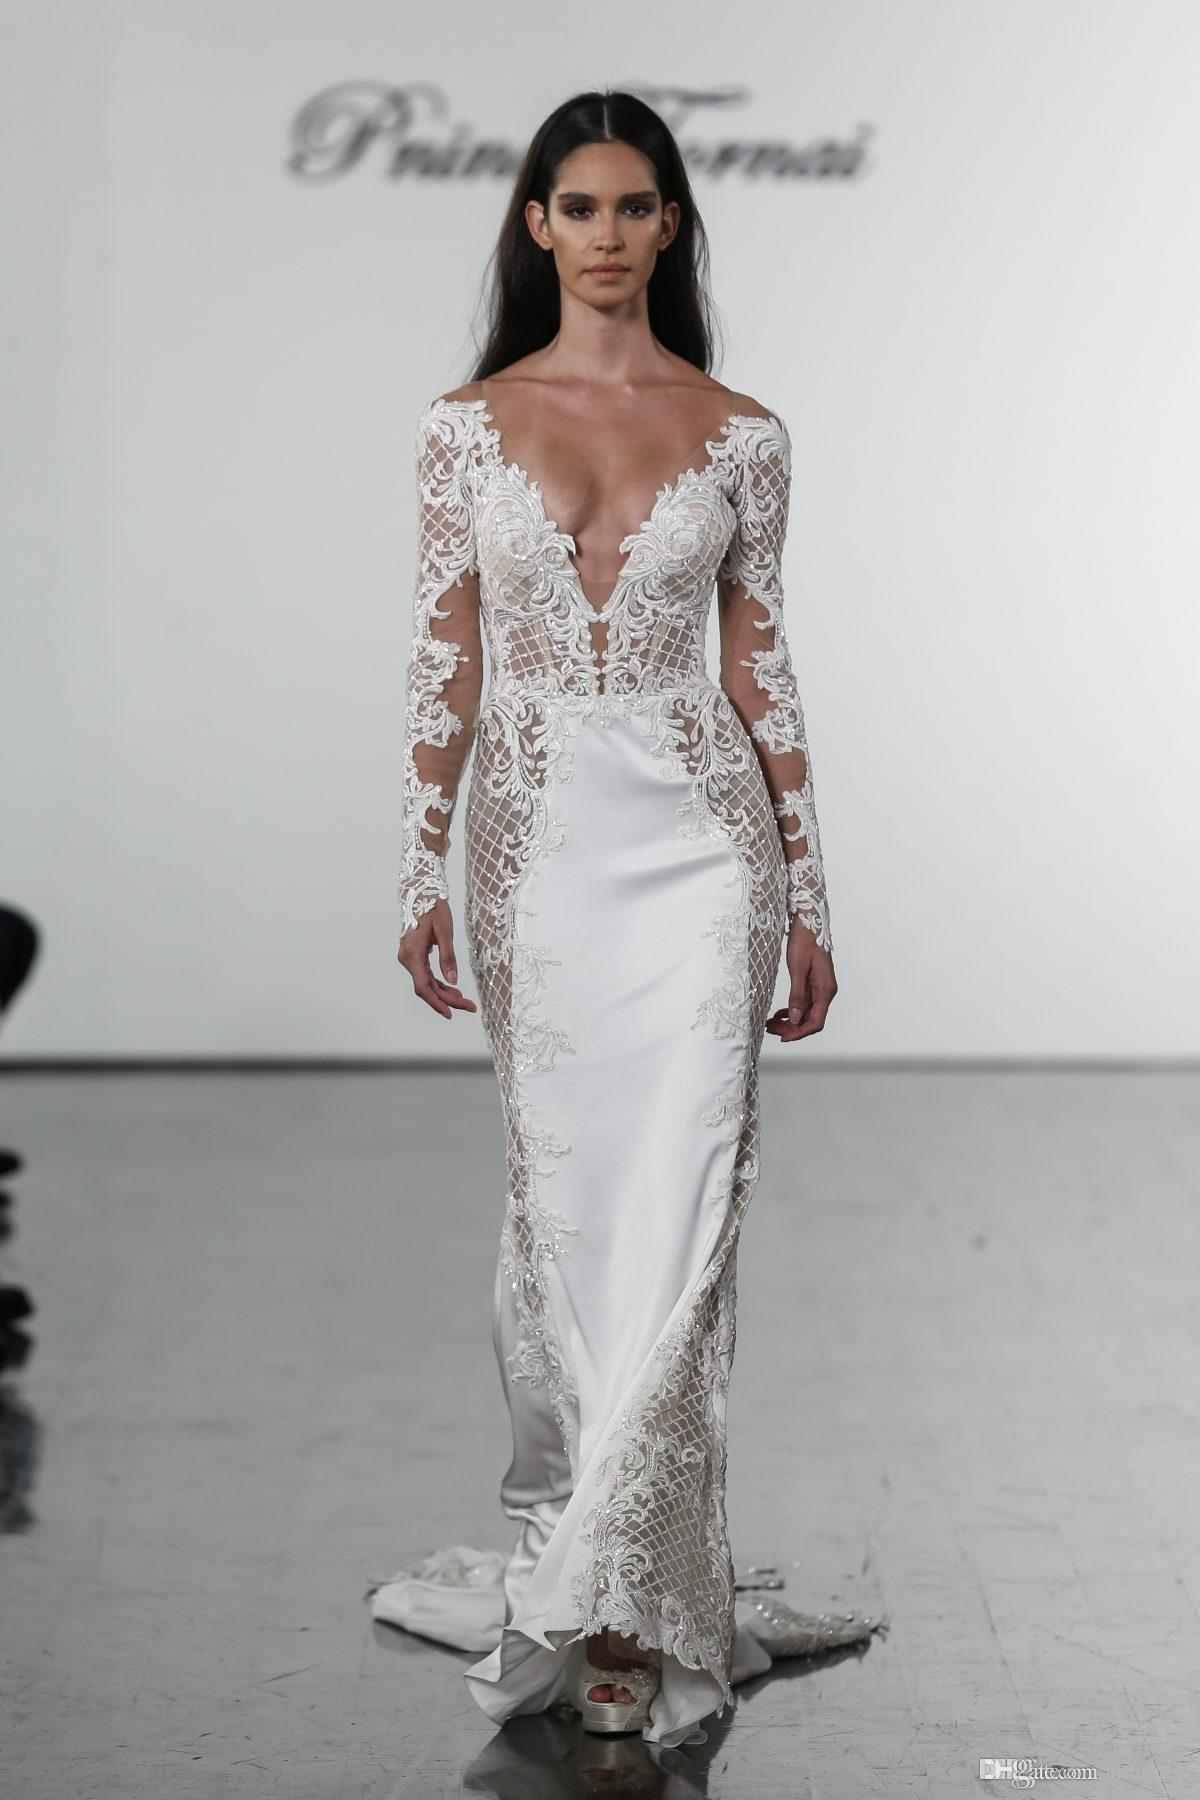 2020 New Pnina Tornai Mermaid Wedding Dresses V Neck Lace Bridal Gowns plus size Long Sleeves Wedding Dress Custom